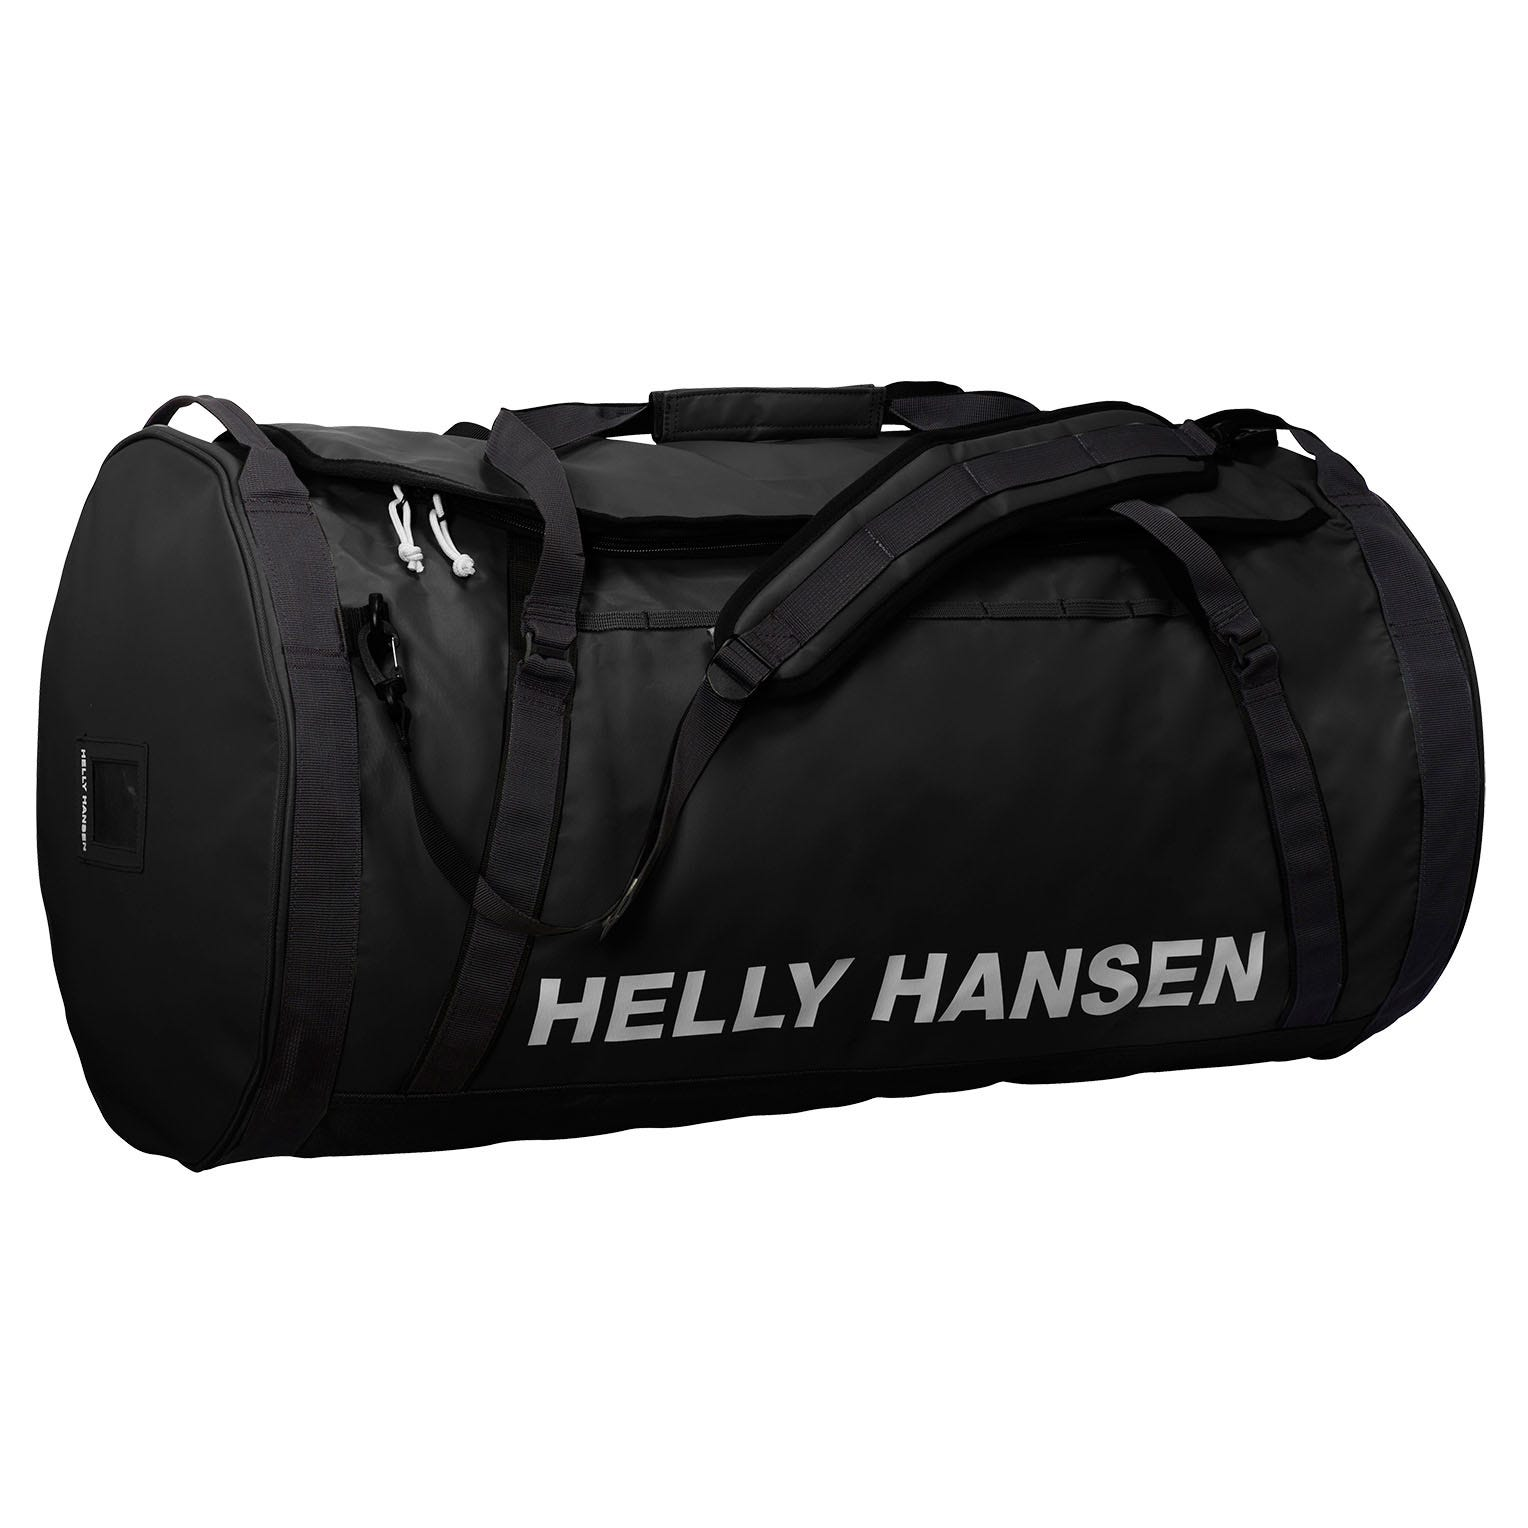 SS19 Helly Hansen Duffel Sac 2 120L